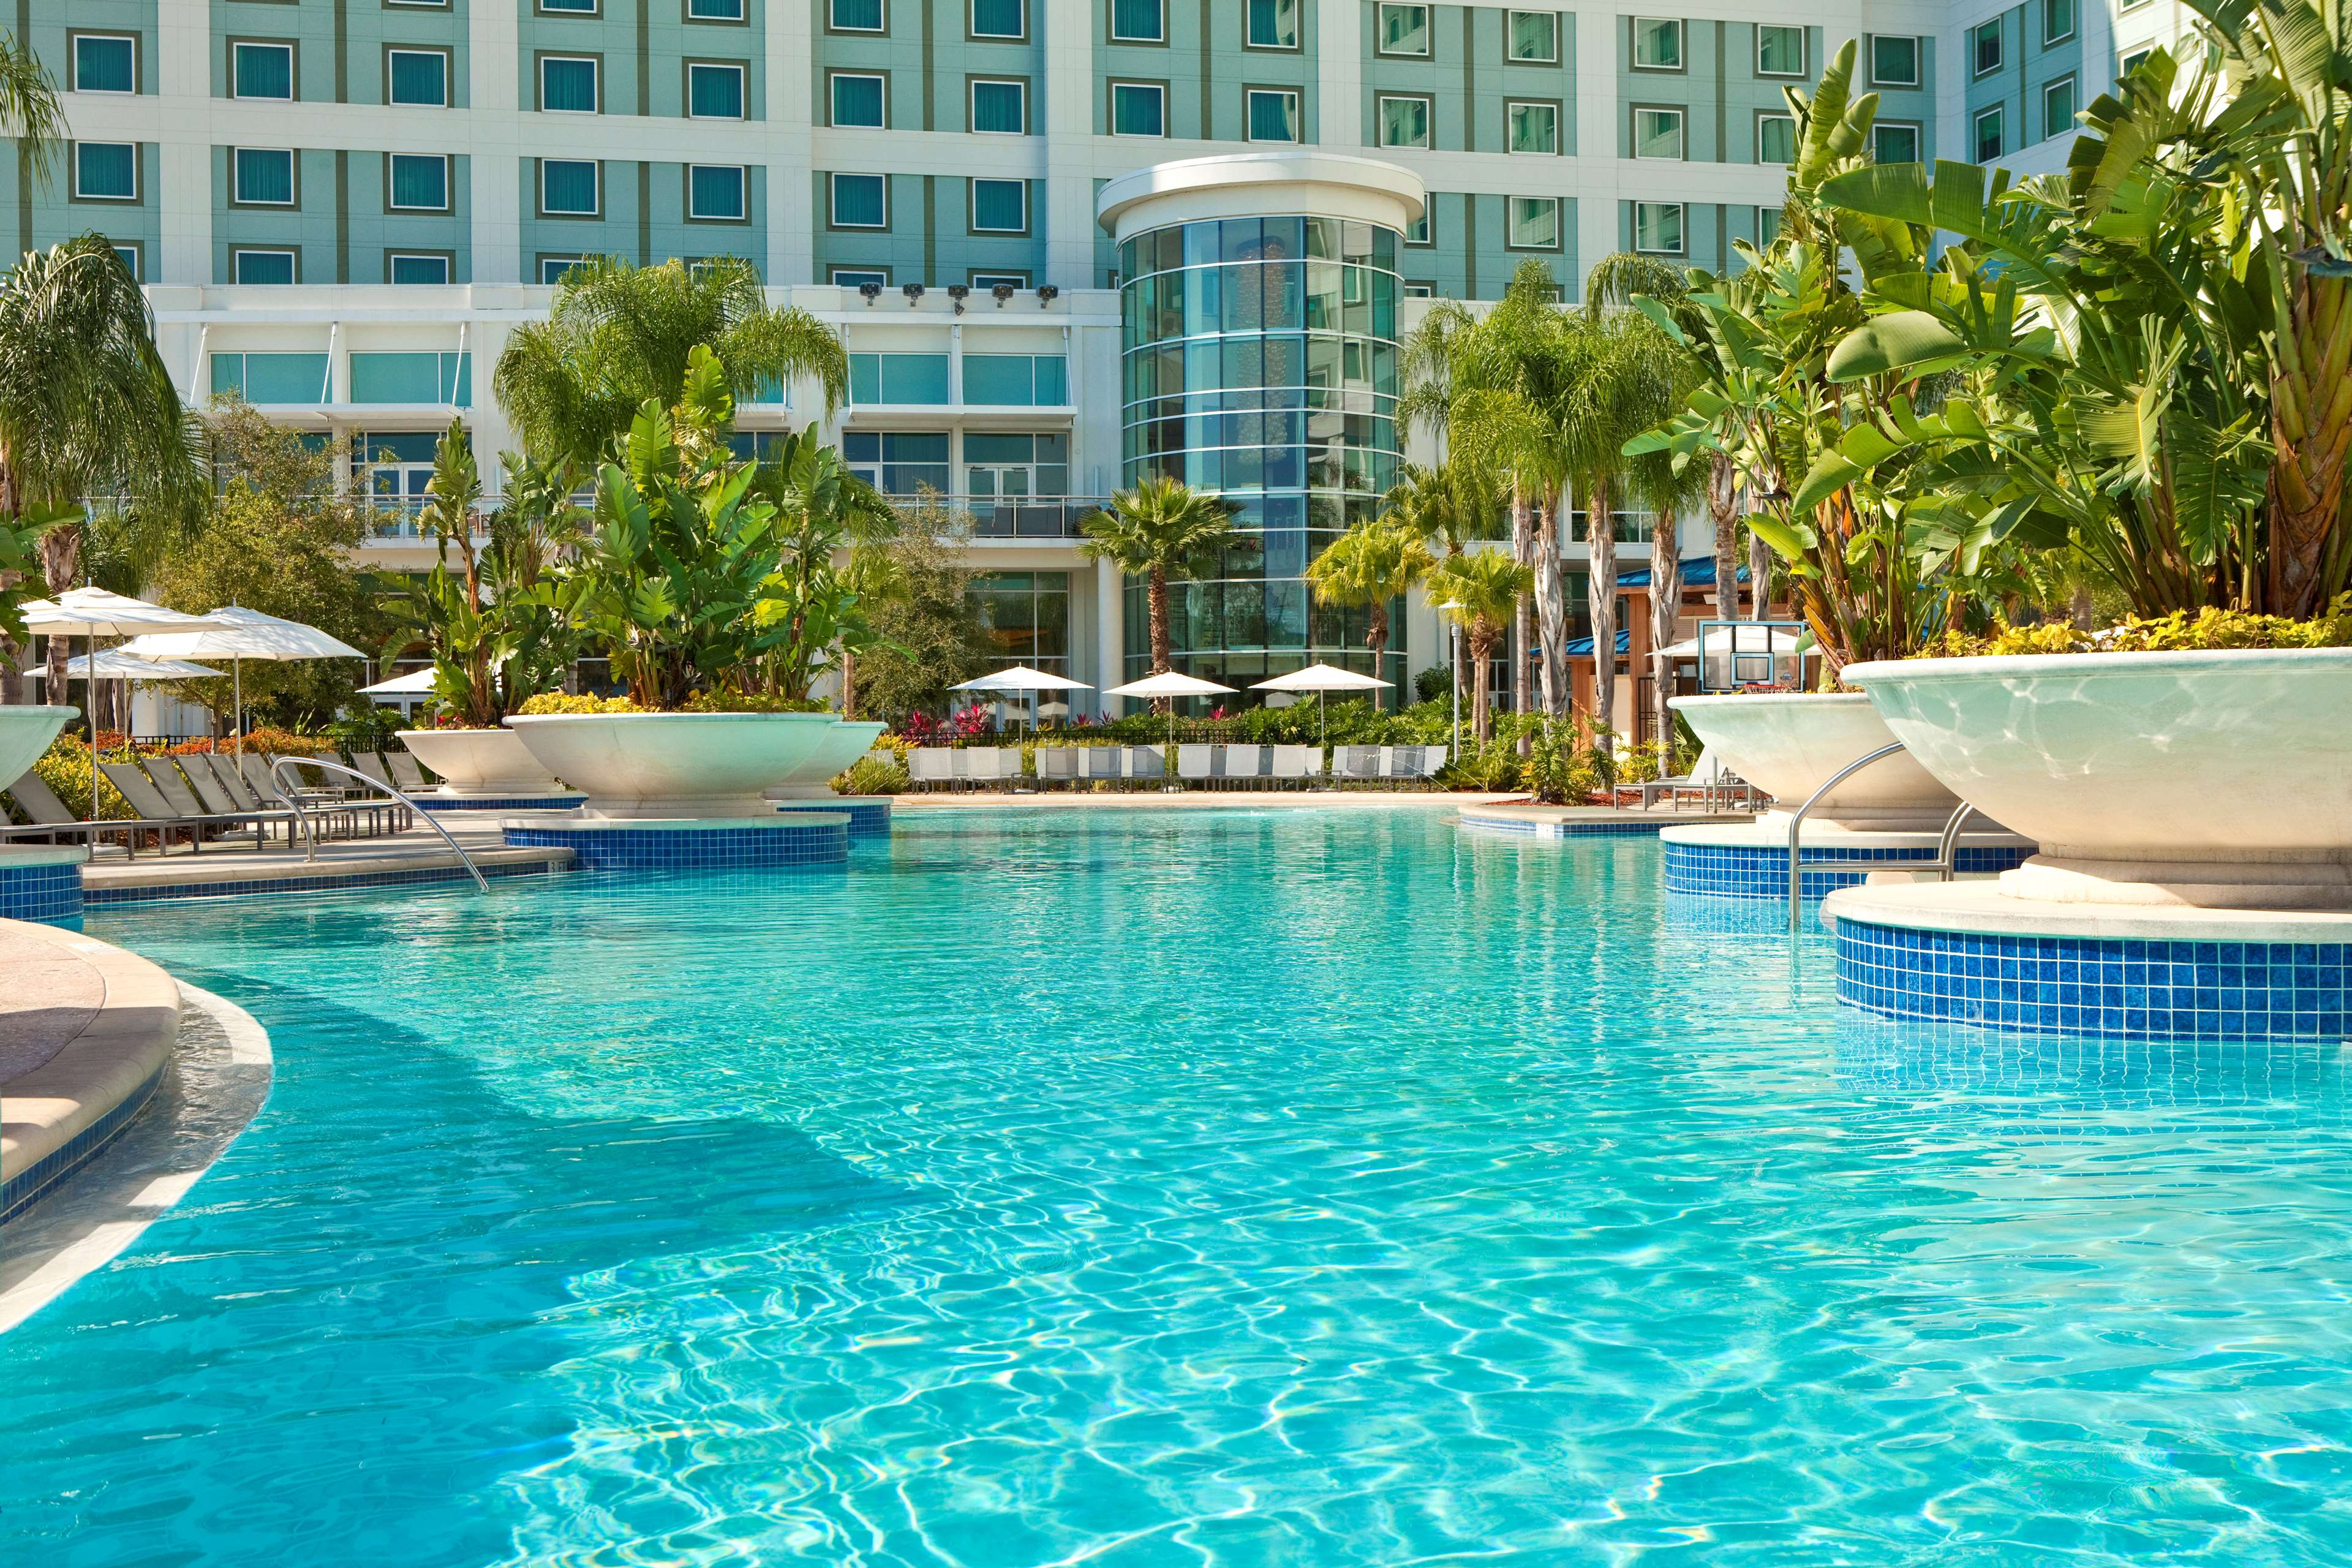 Hilton Orlando image 16